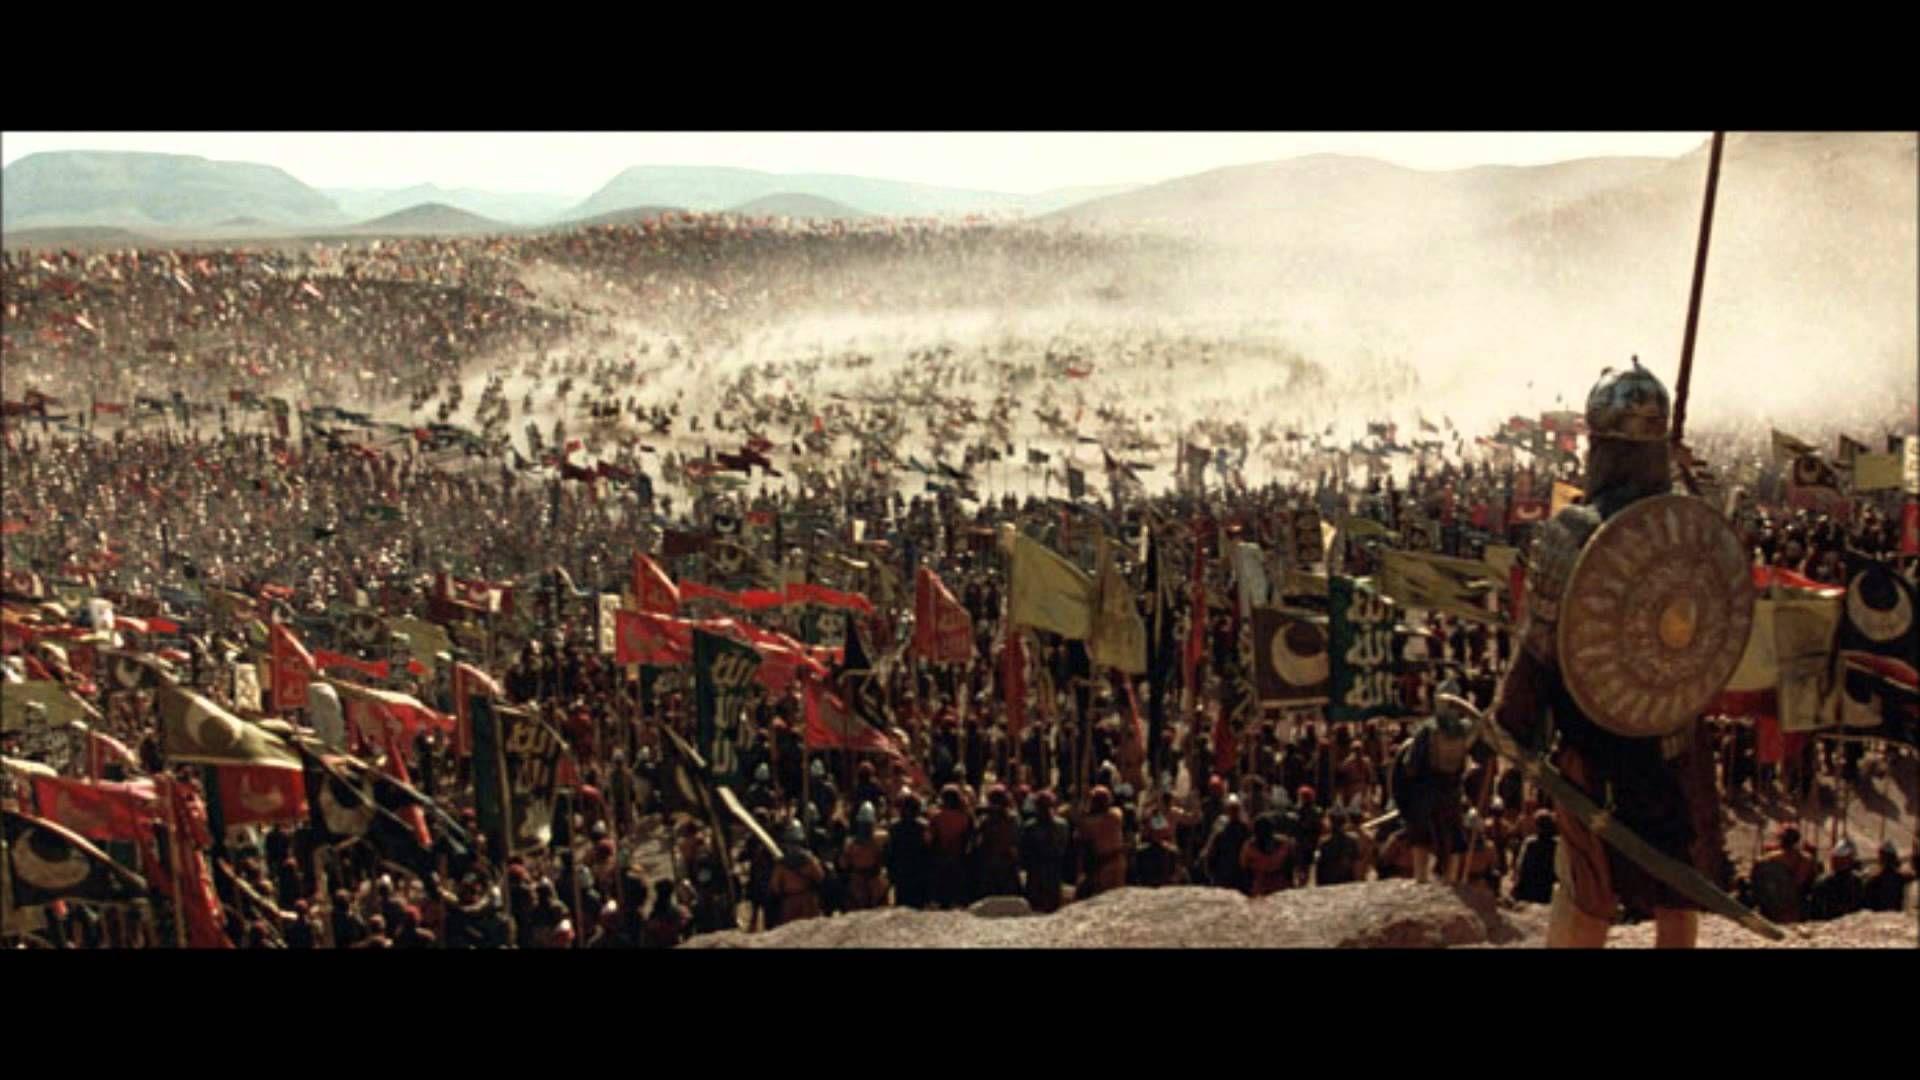 Salahuddin Al Ayubi┇The King of Jerusalem, Syria, Egypt!┇POWERFUL